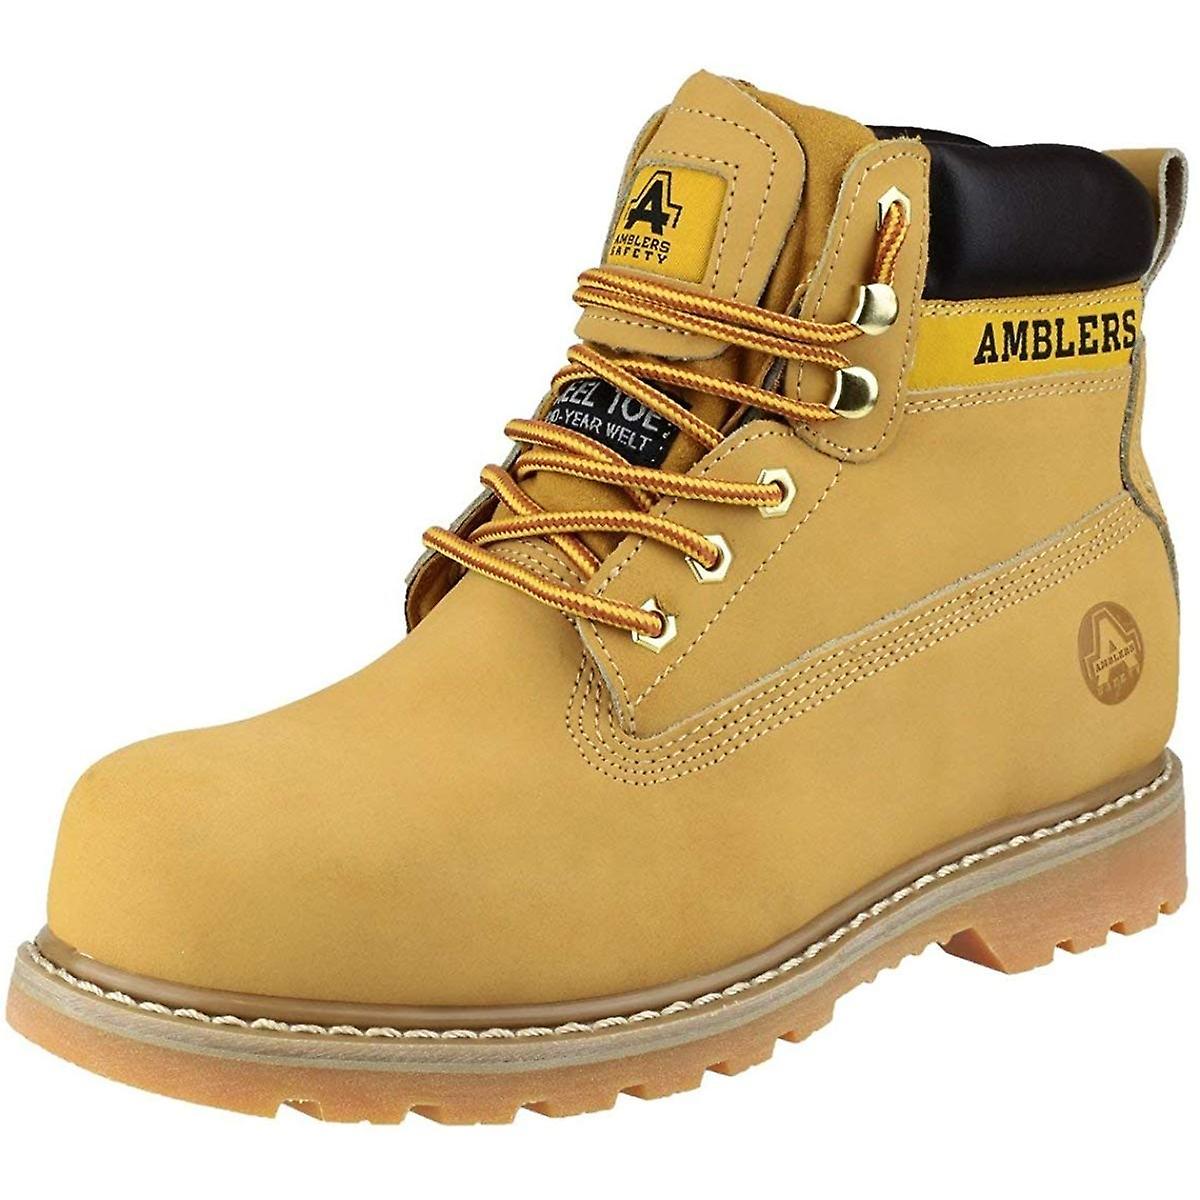 Amblers Steel FS7 Steel Toe Cap Boot / Womens Boots OnDNKM